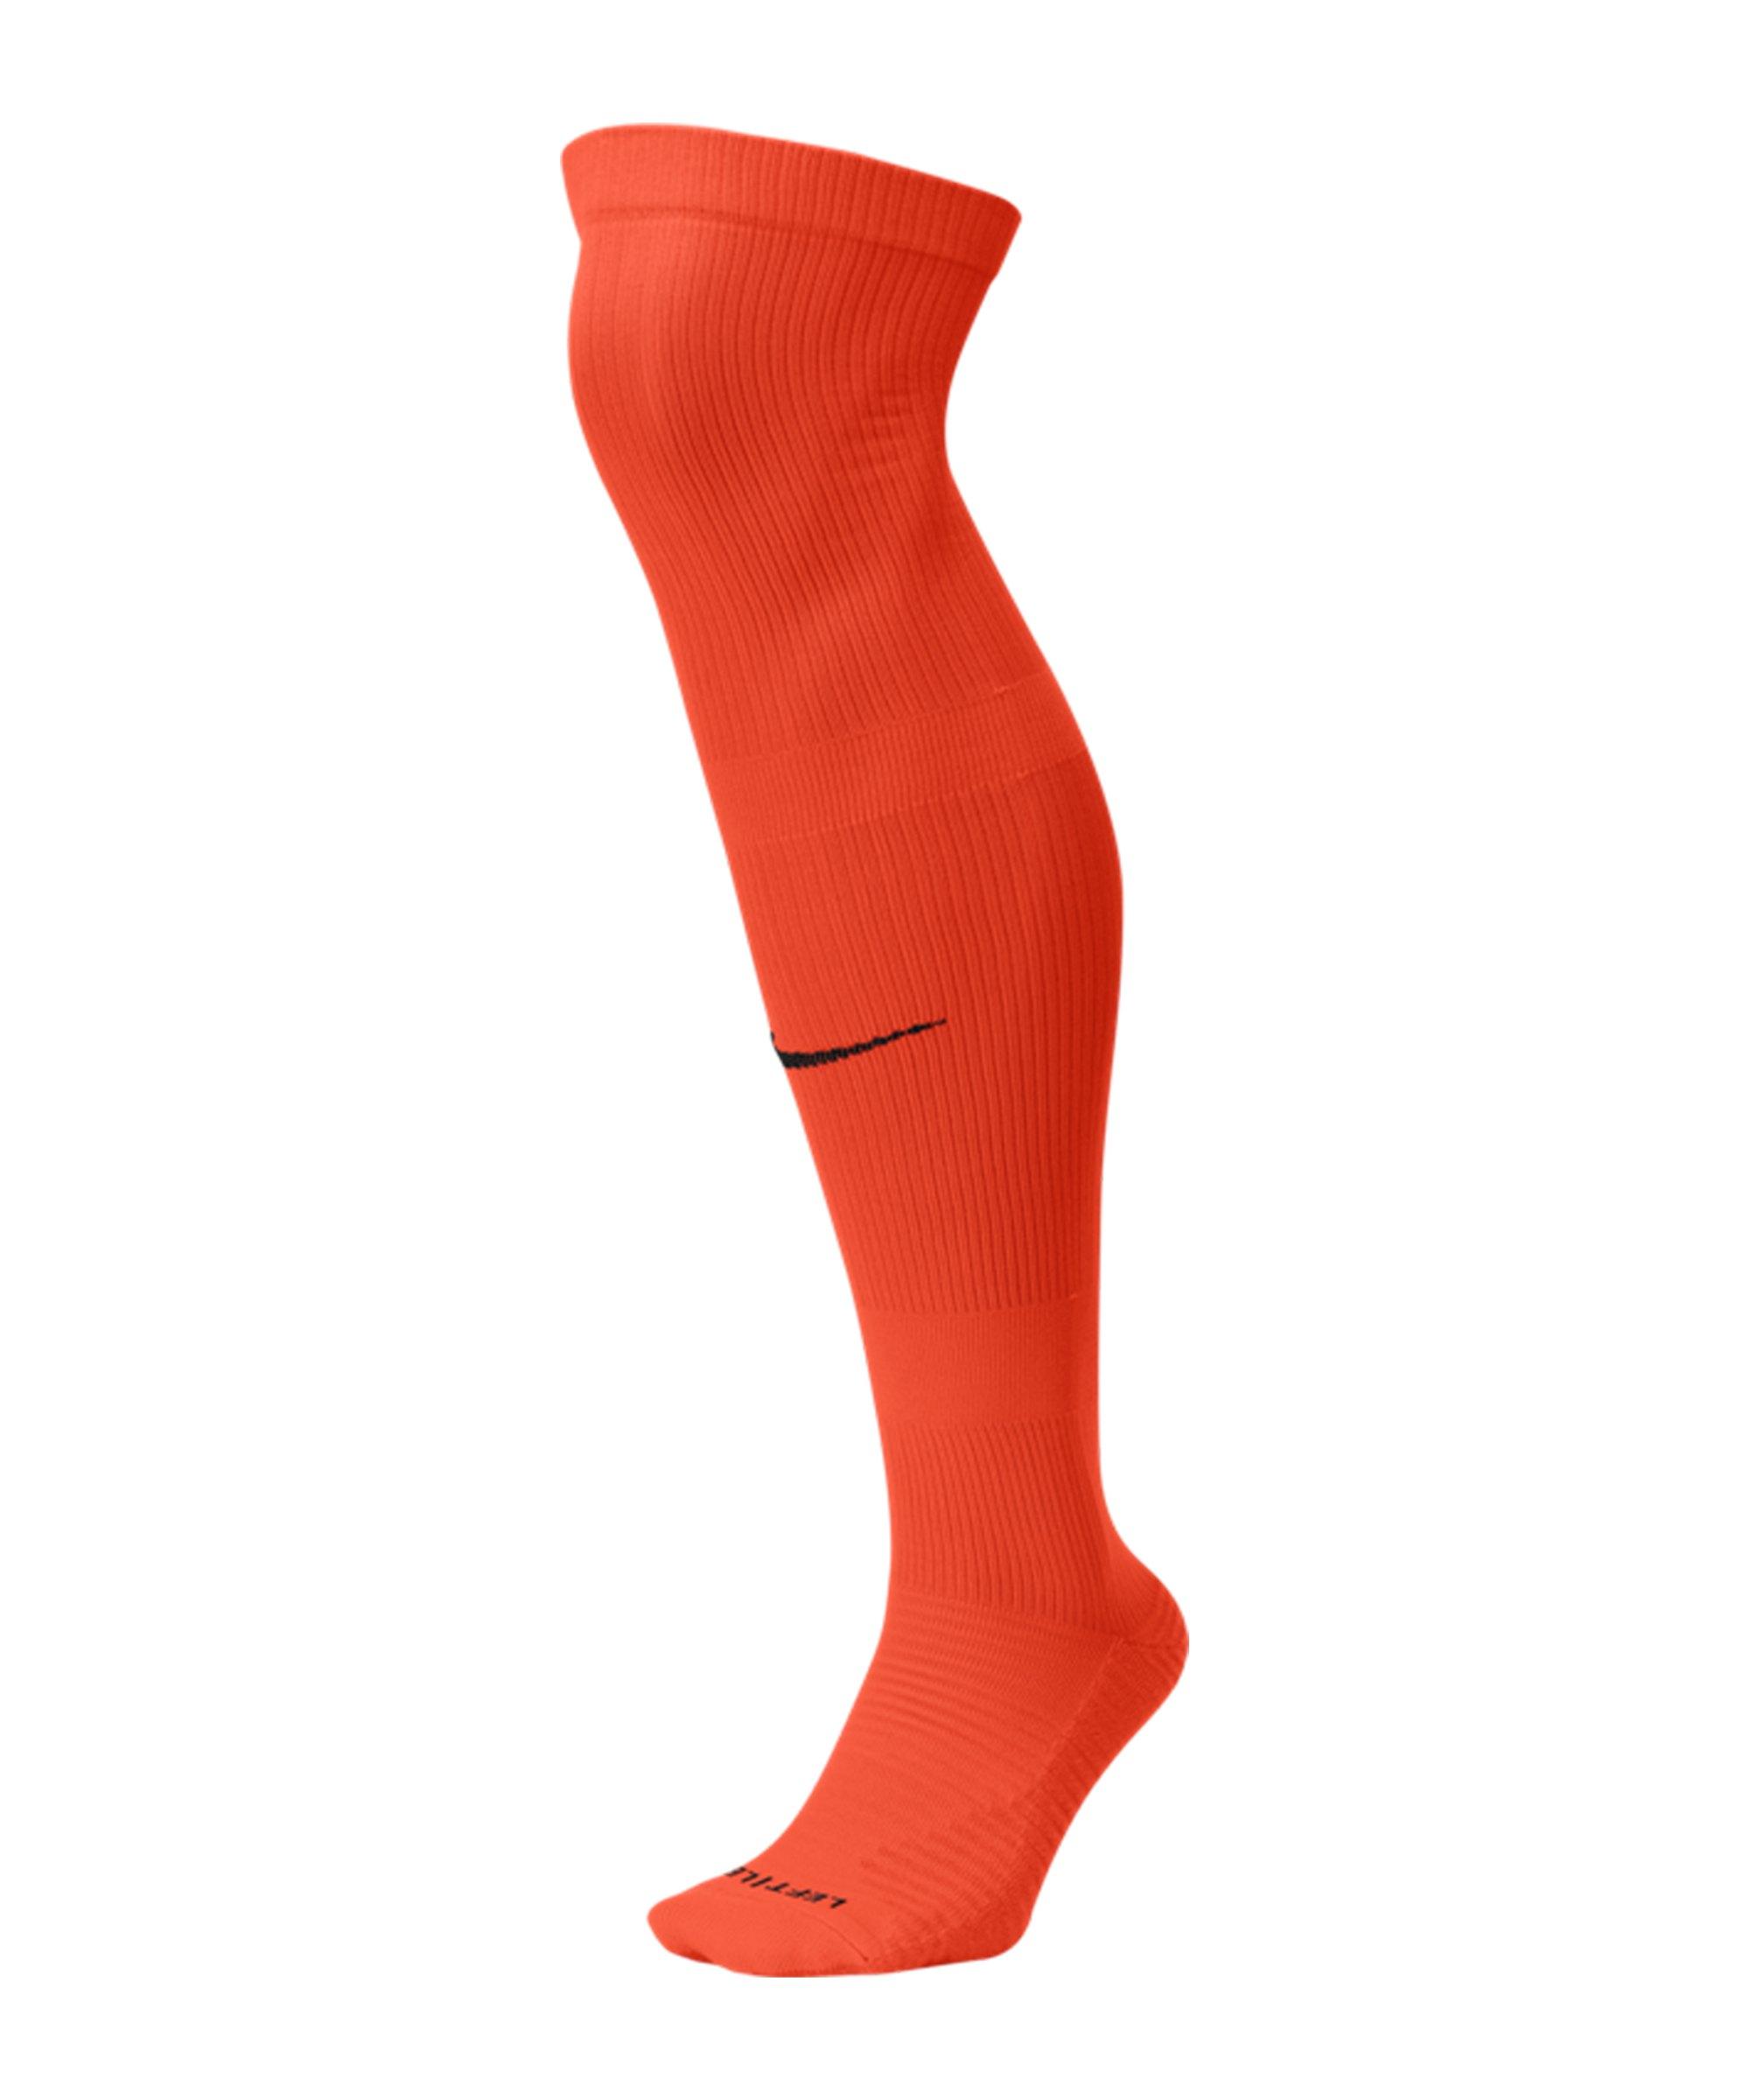 Nike Matchfit OTC Knee High Stutzenstrumpf F891 - orange